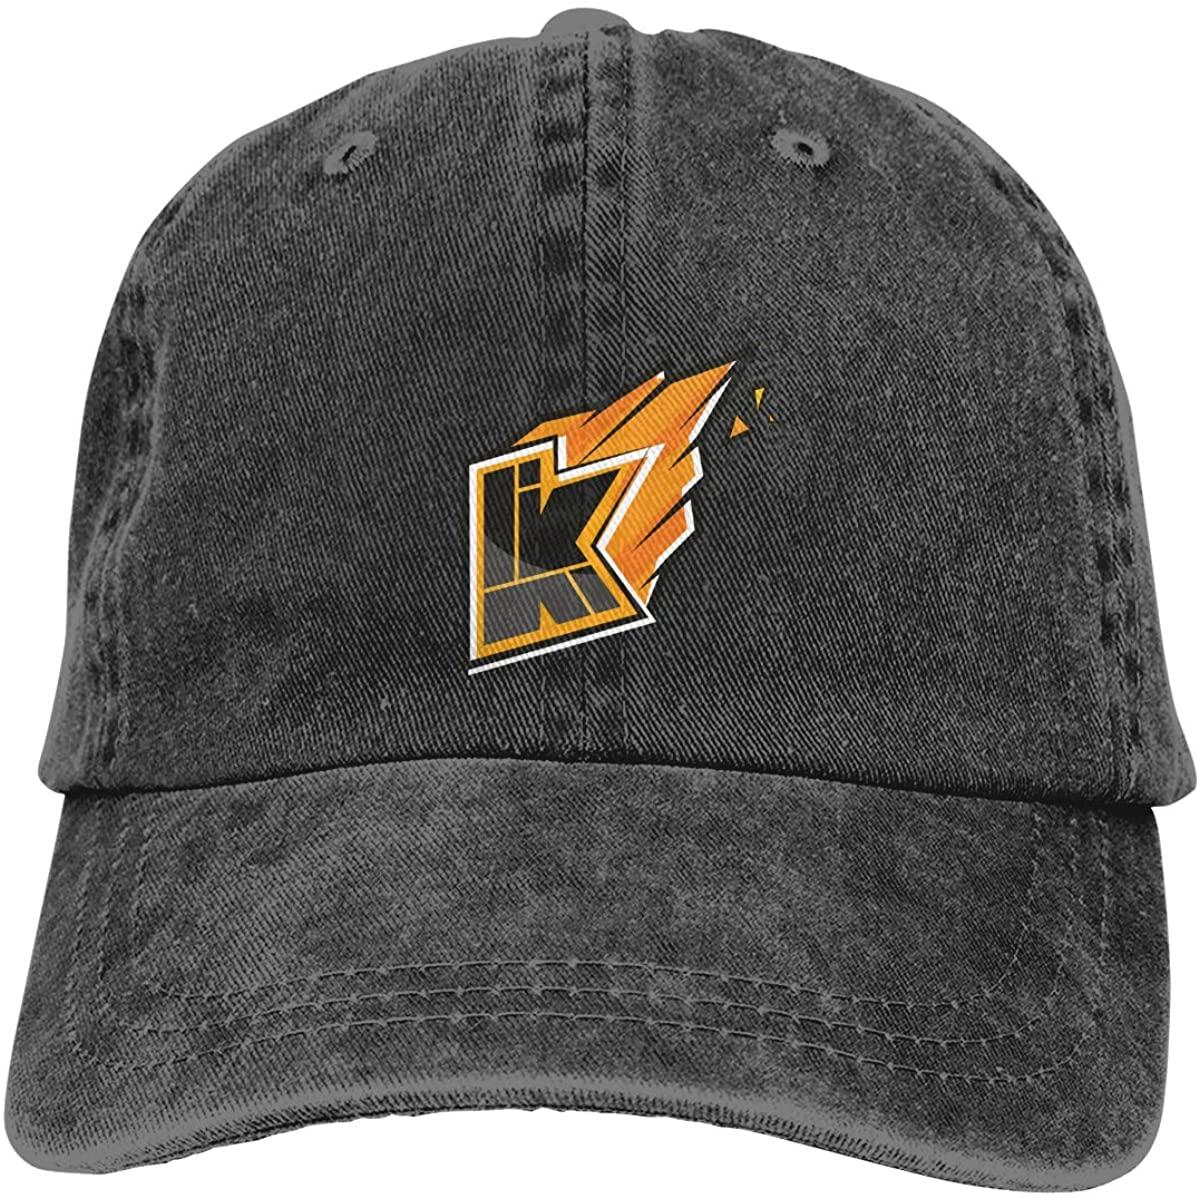 NOT Kwe-Bbelkop Logo Adjustable Unisex Hat Baseball Caps Black